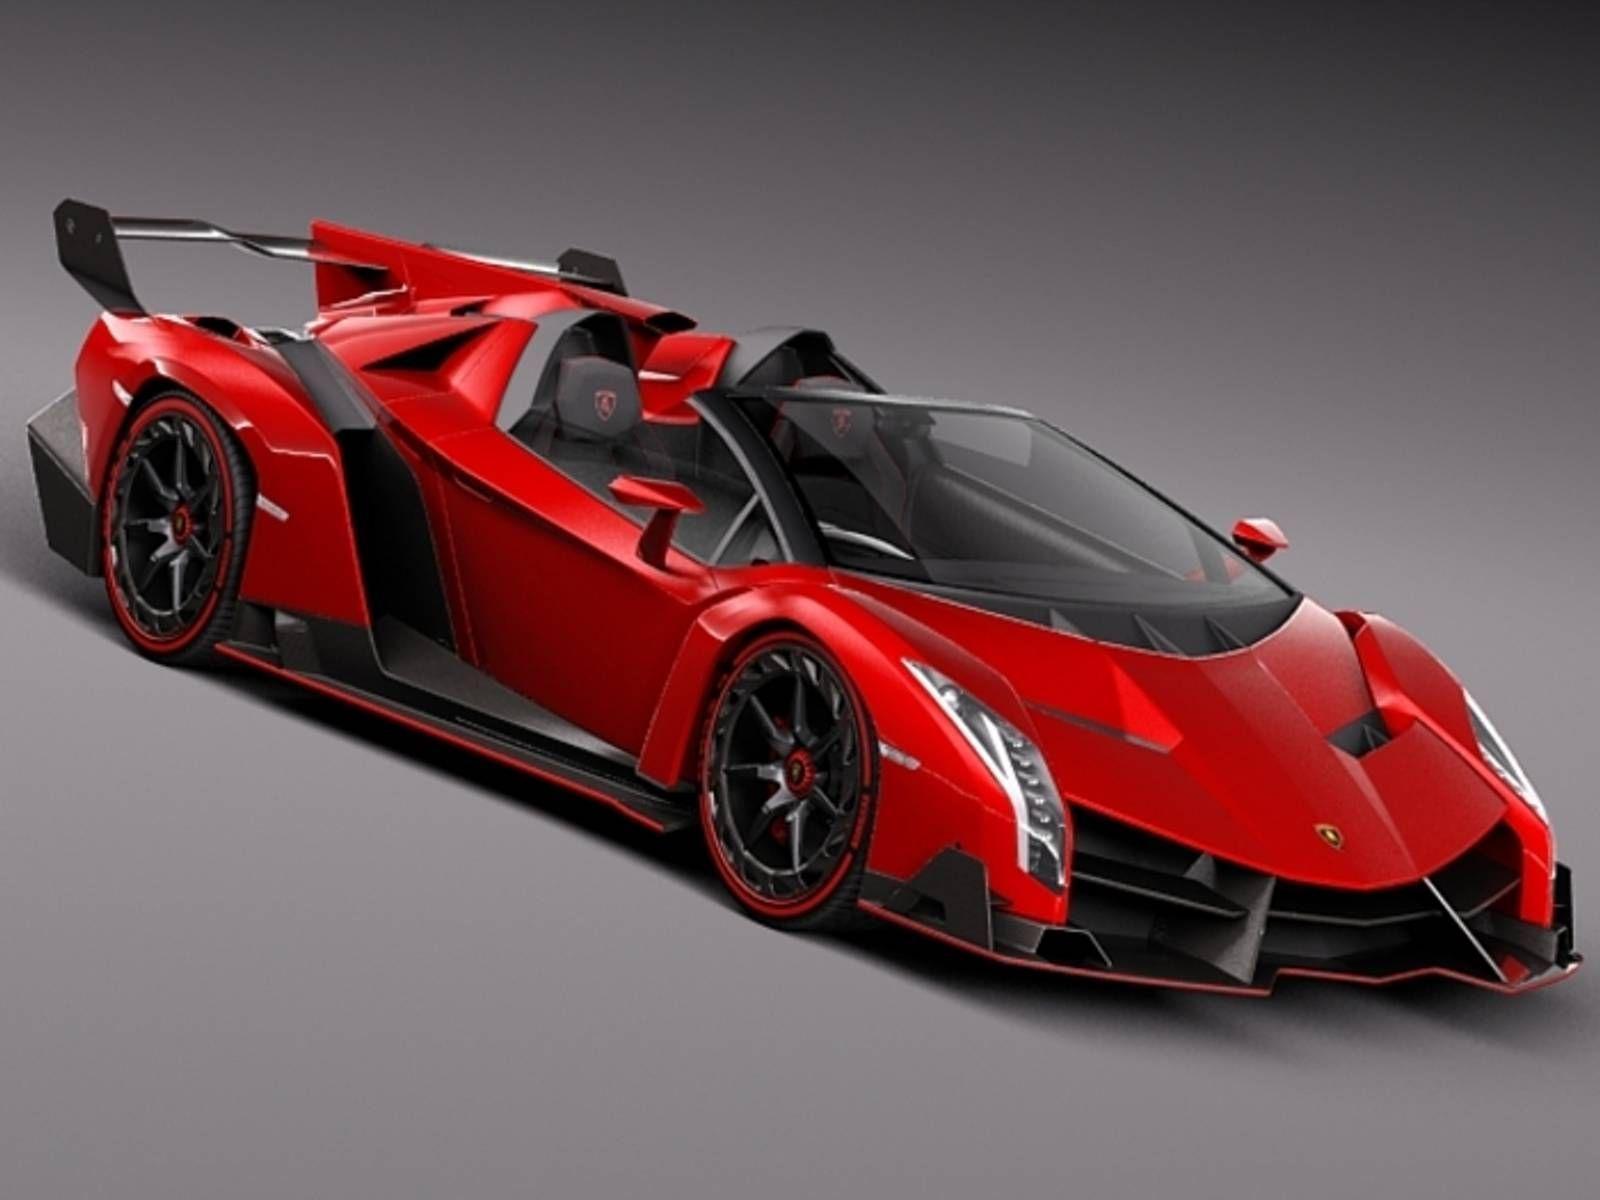 2560x1440 Lamborghini Desktop Backgrounds Images Jpg